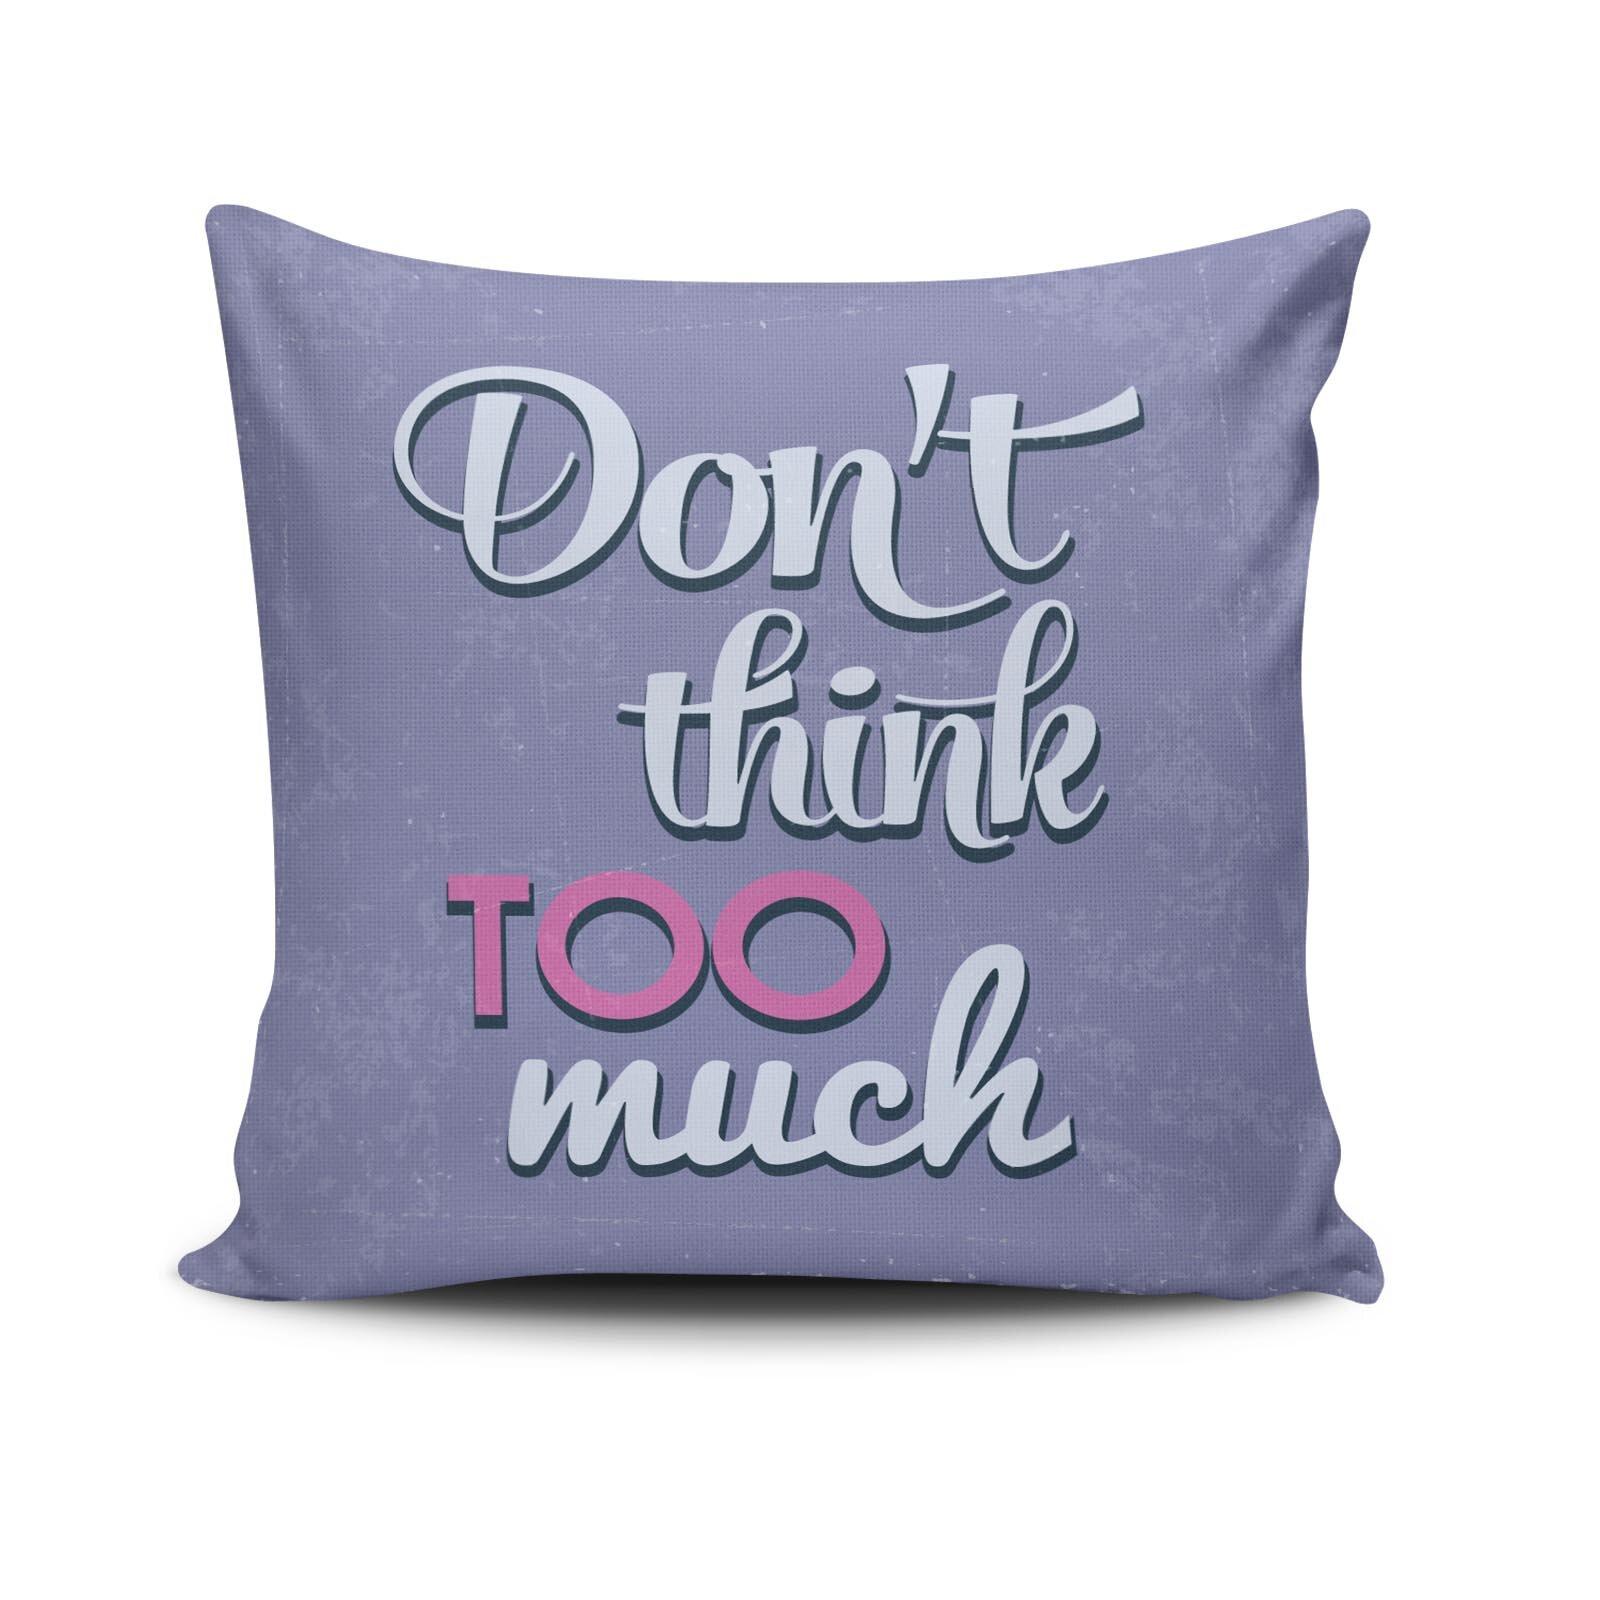 Perna decorativa Cushion Love, Dimensiune: 45 x 45 cm, Material exterior: 50% bumbac / 50% poliester 768CLV0235